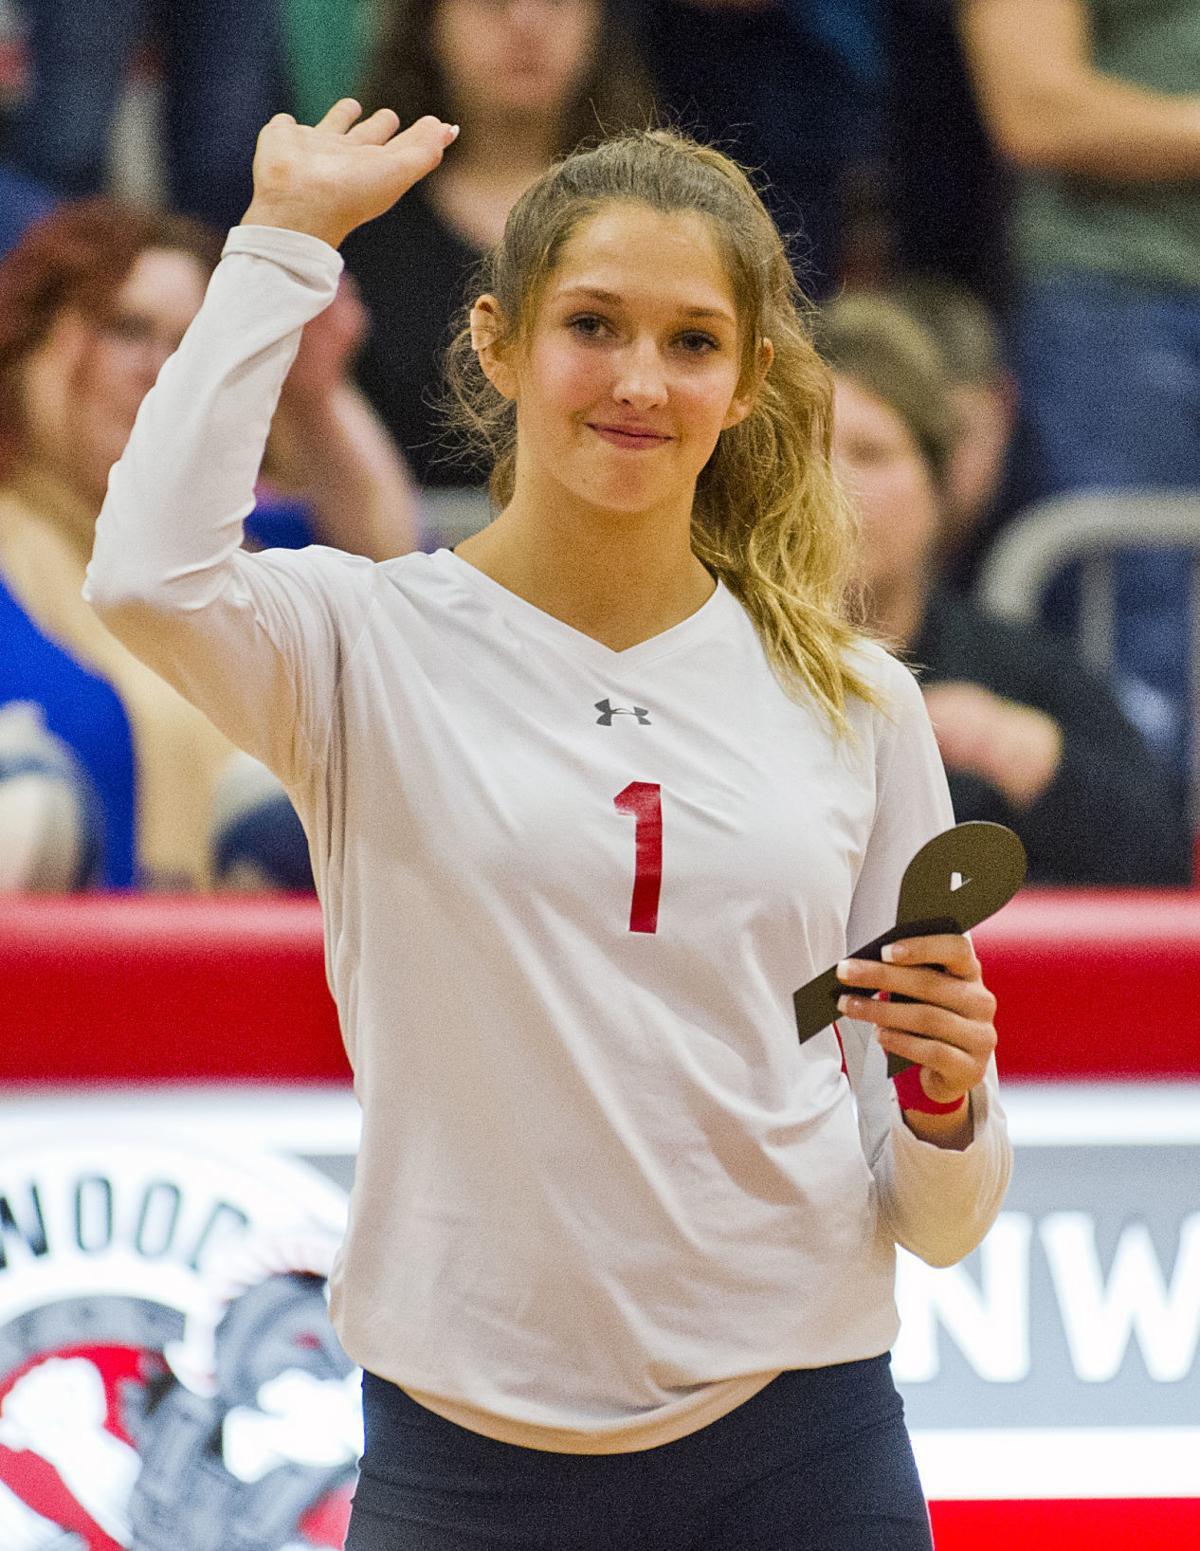 Volleyball: Arlington at Stanwood, 10.22.19